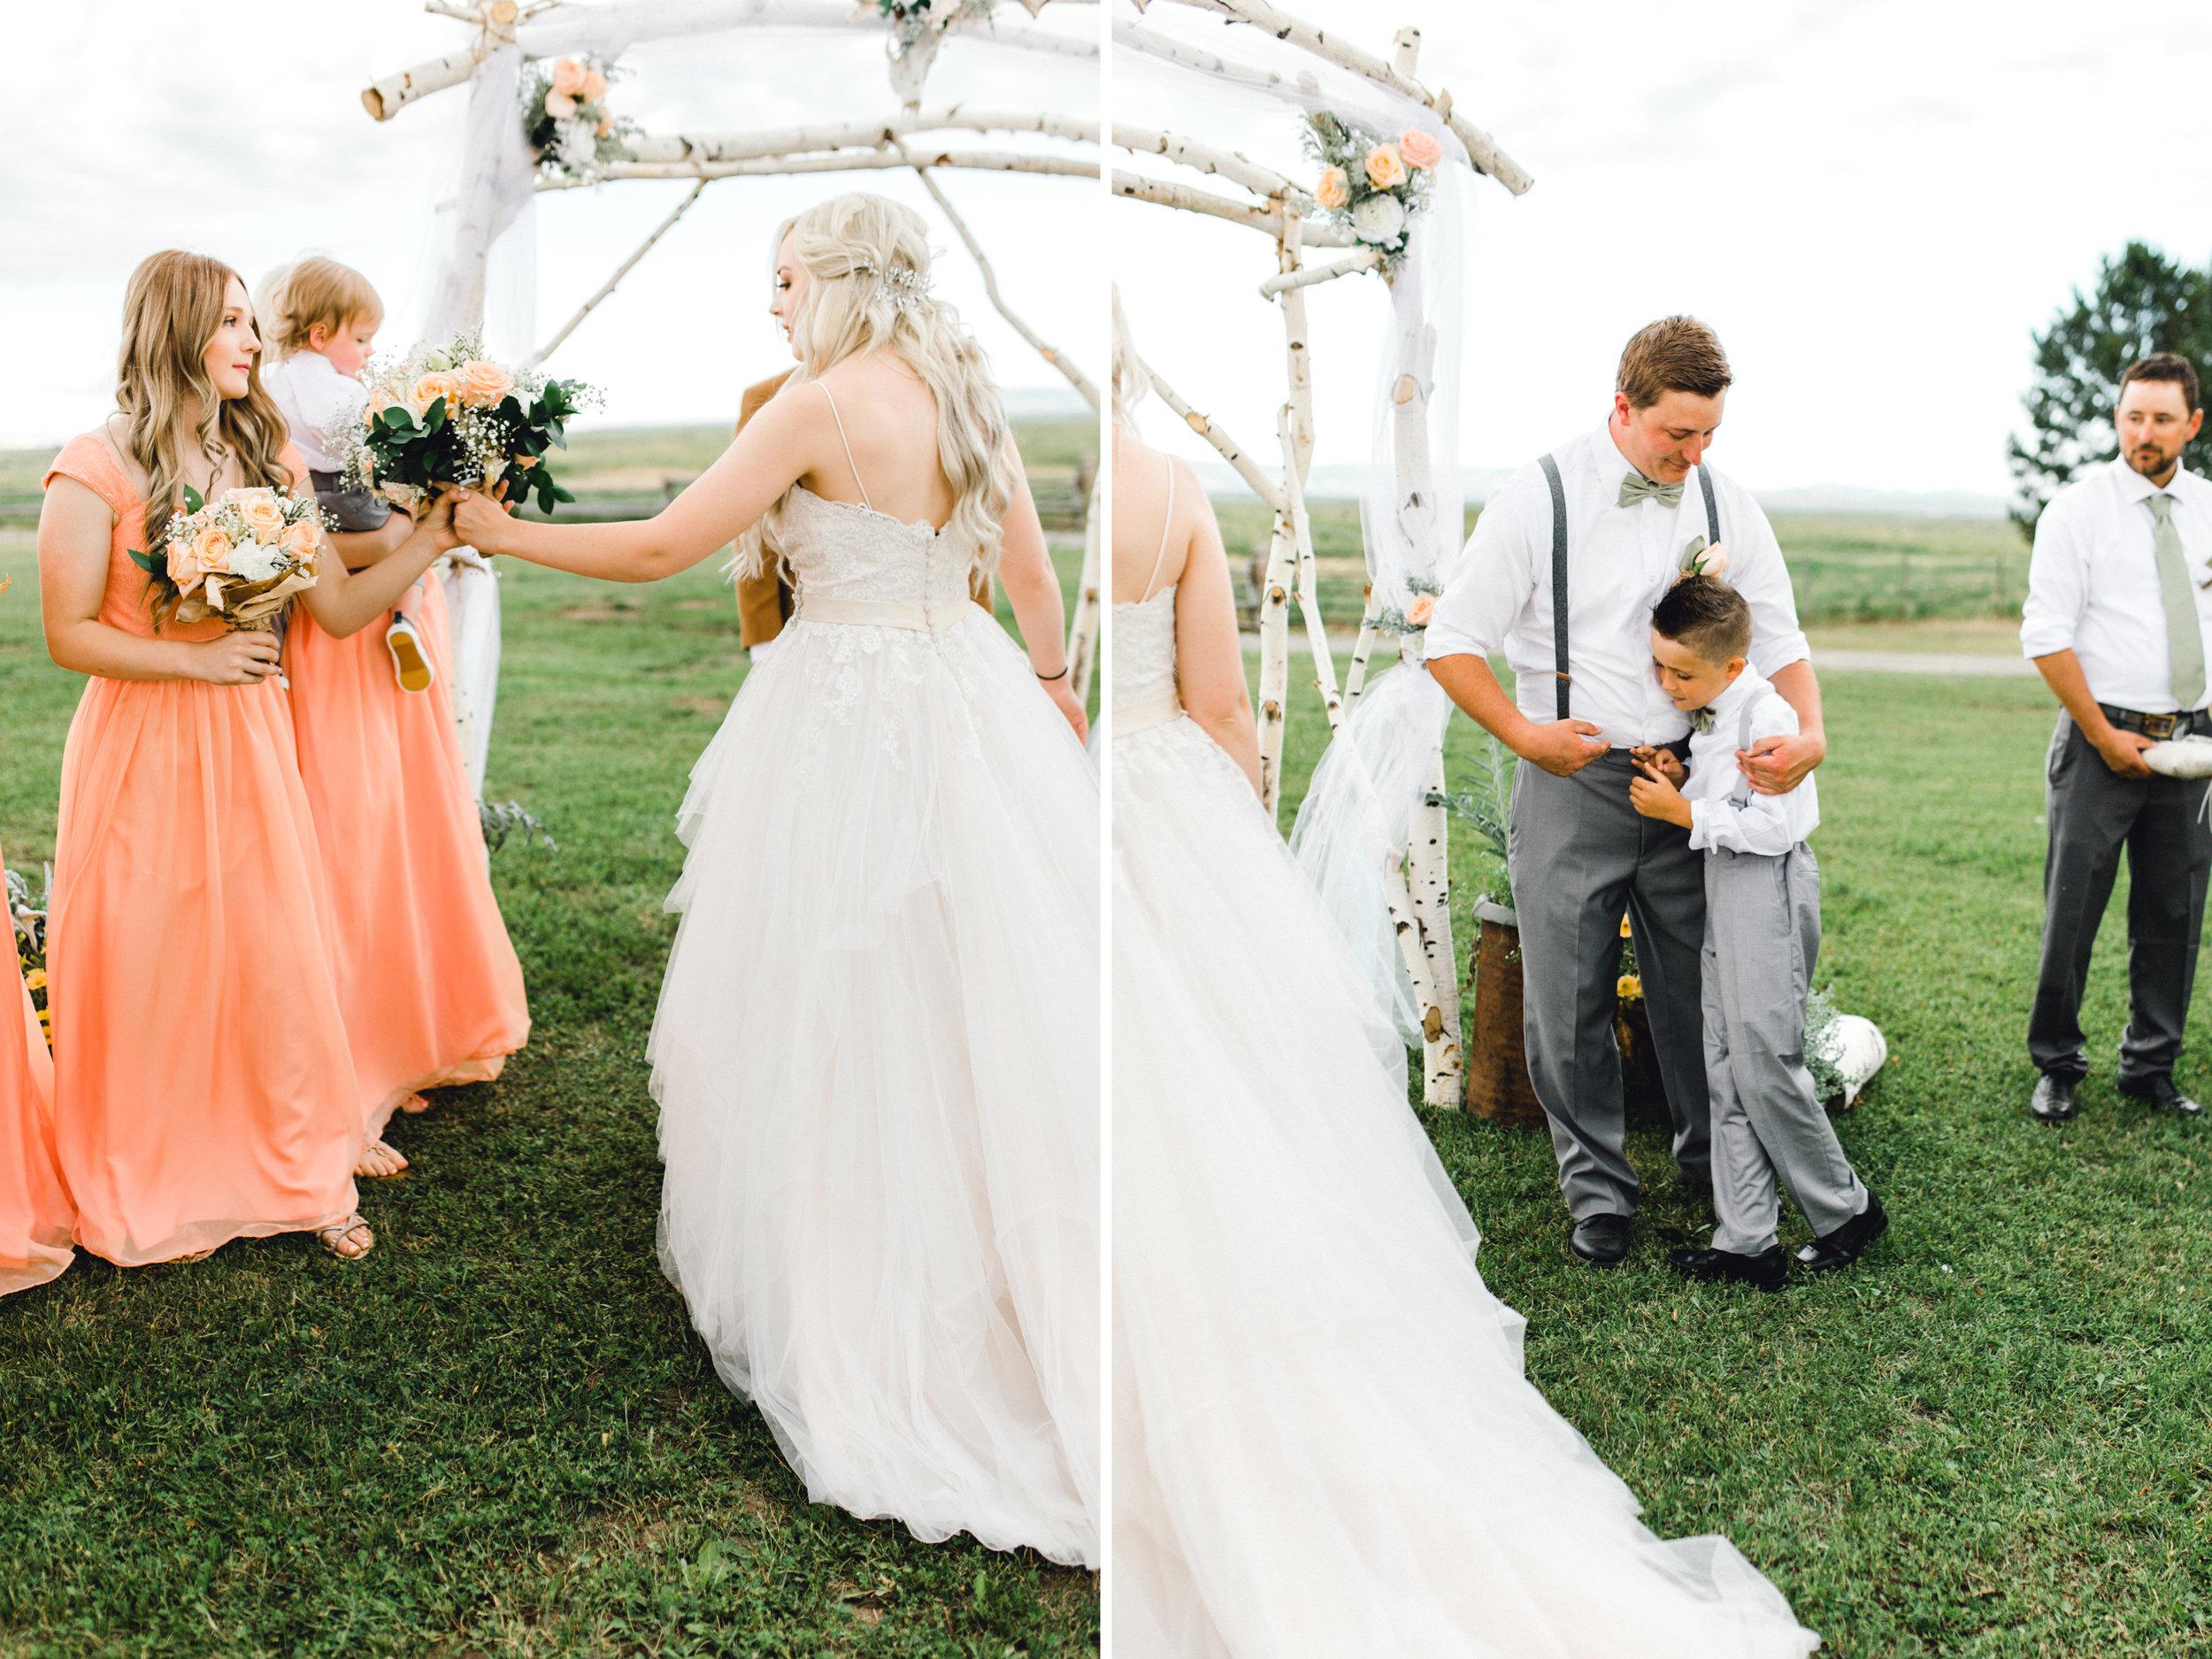 country-outdoor-rustic-wedding-tetons-idaho-anna-christine-photo-18.jpg